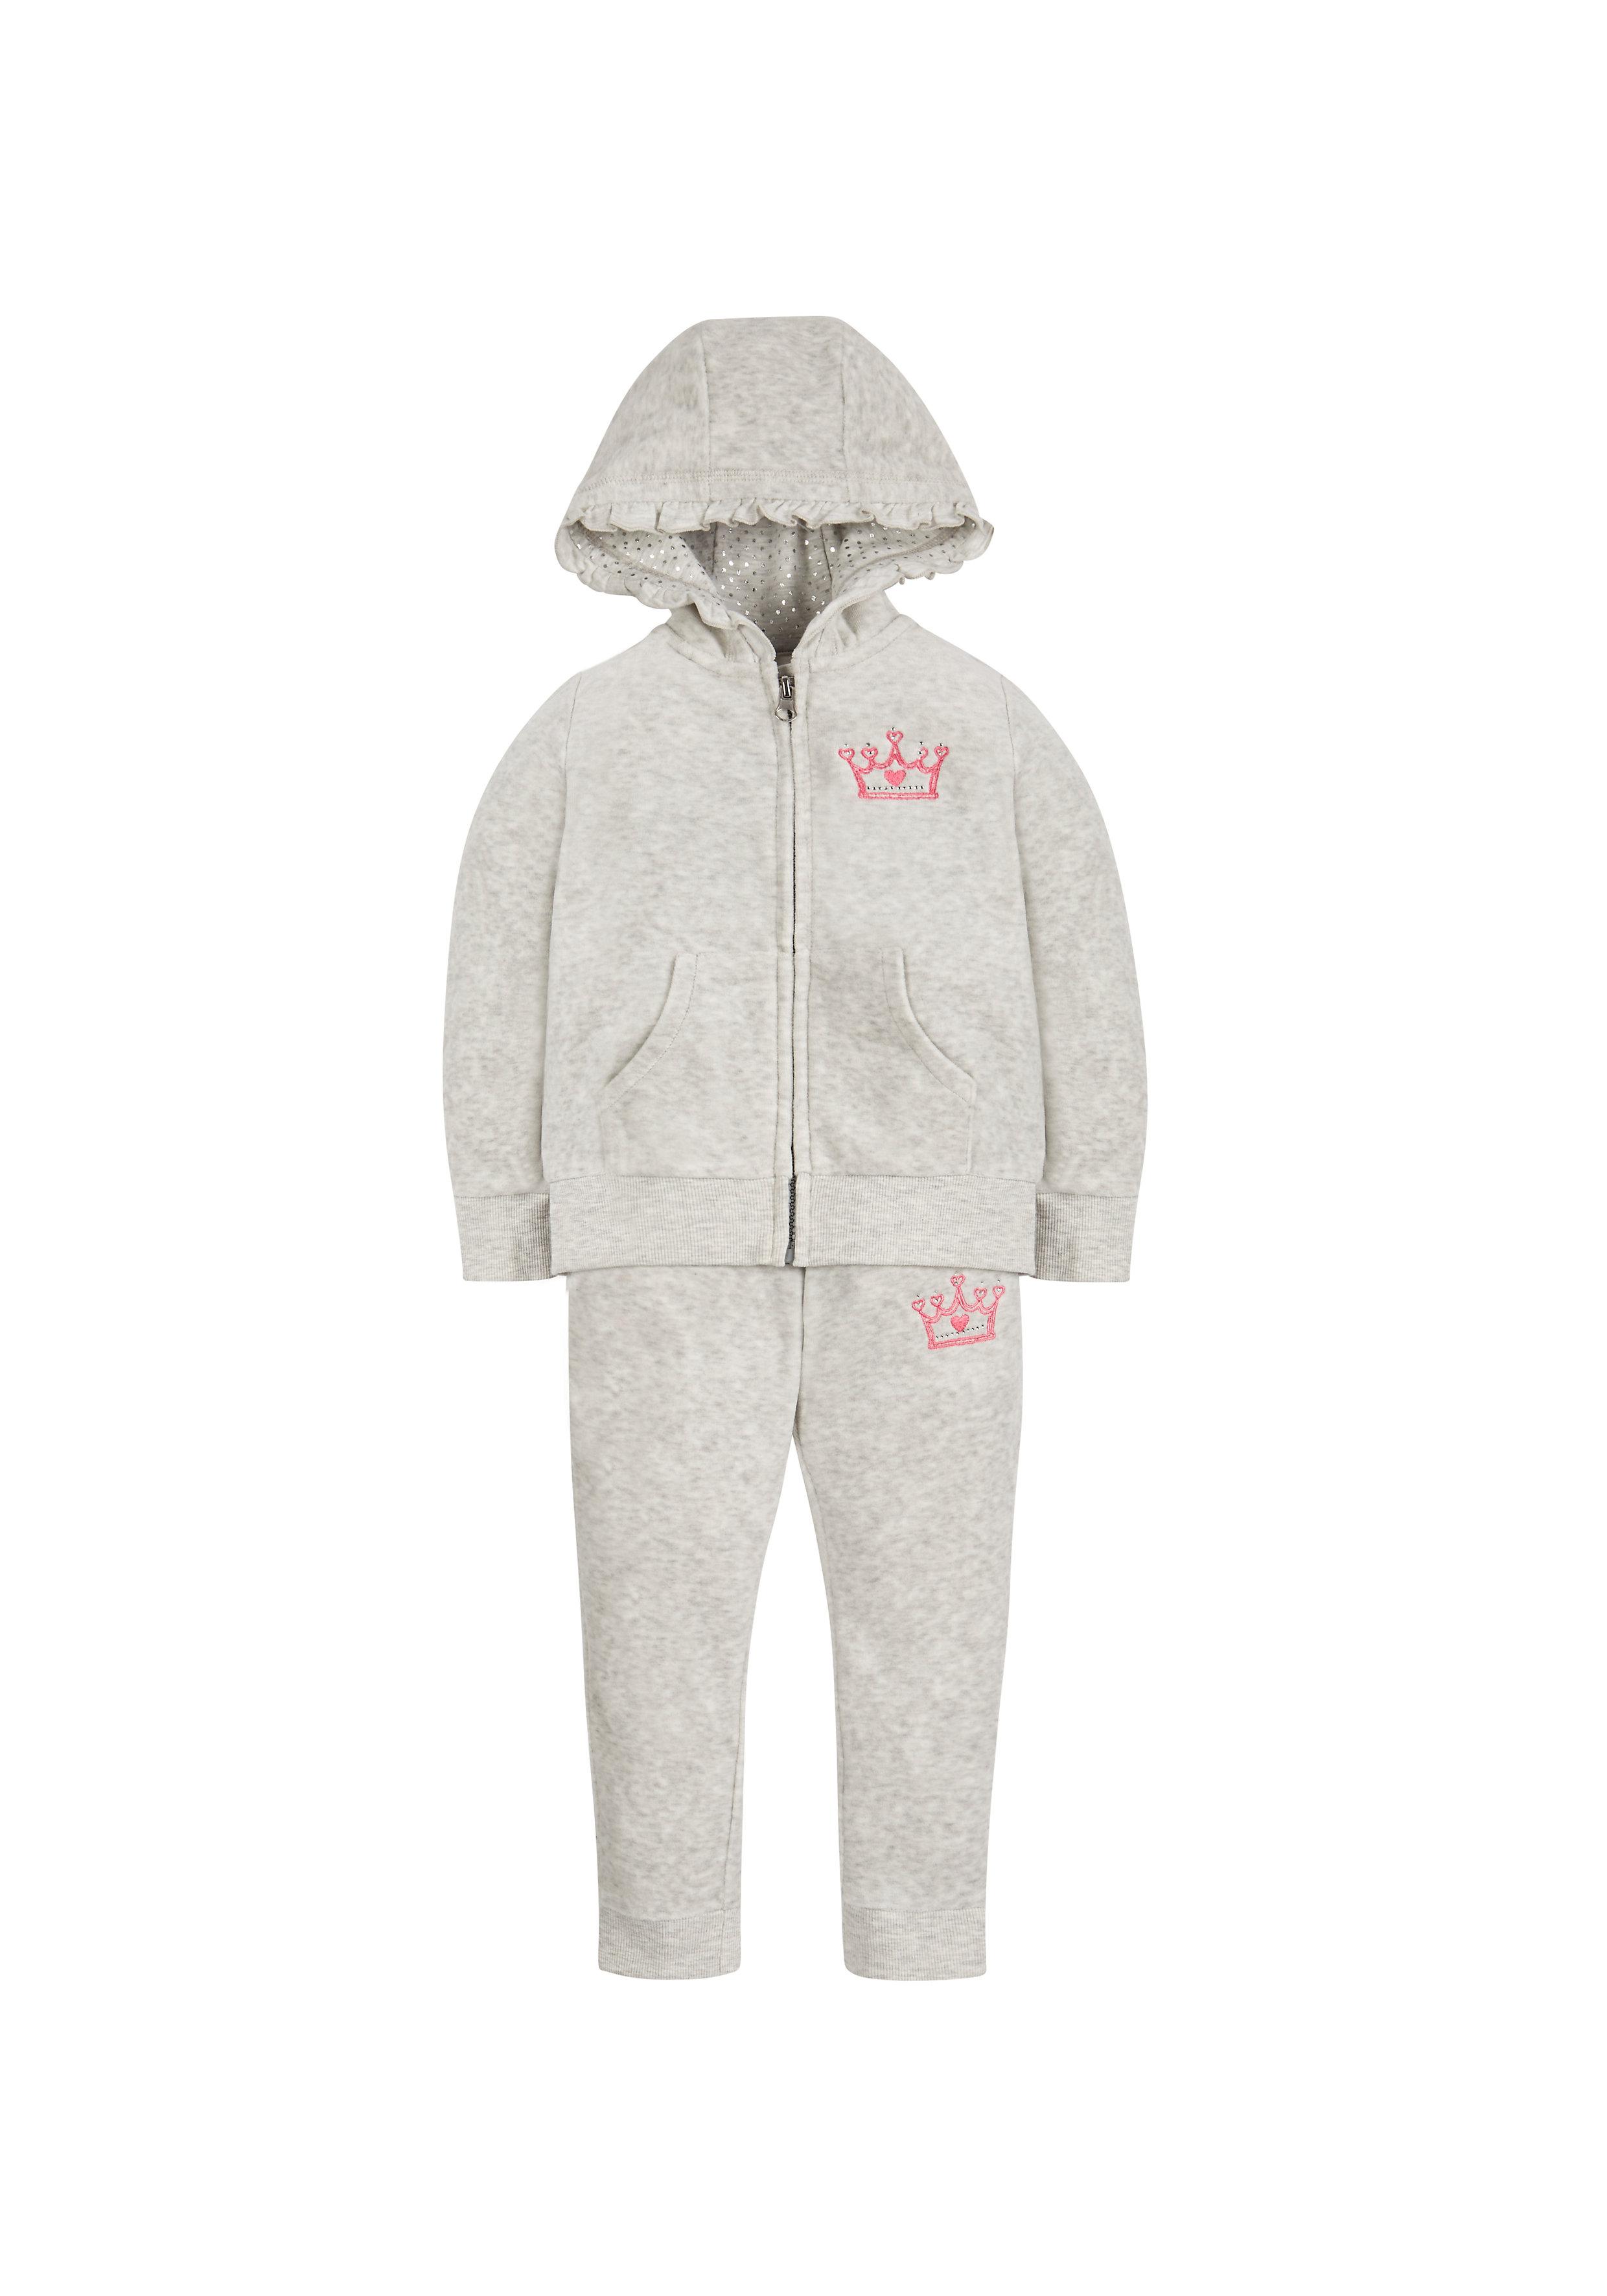 Mothercare   Girls Velour Jog Set - Grey